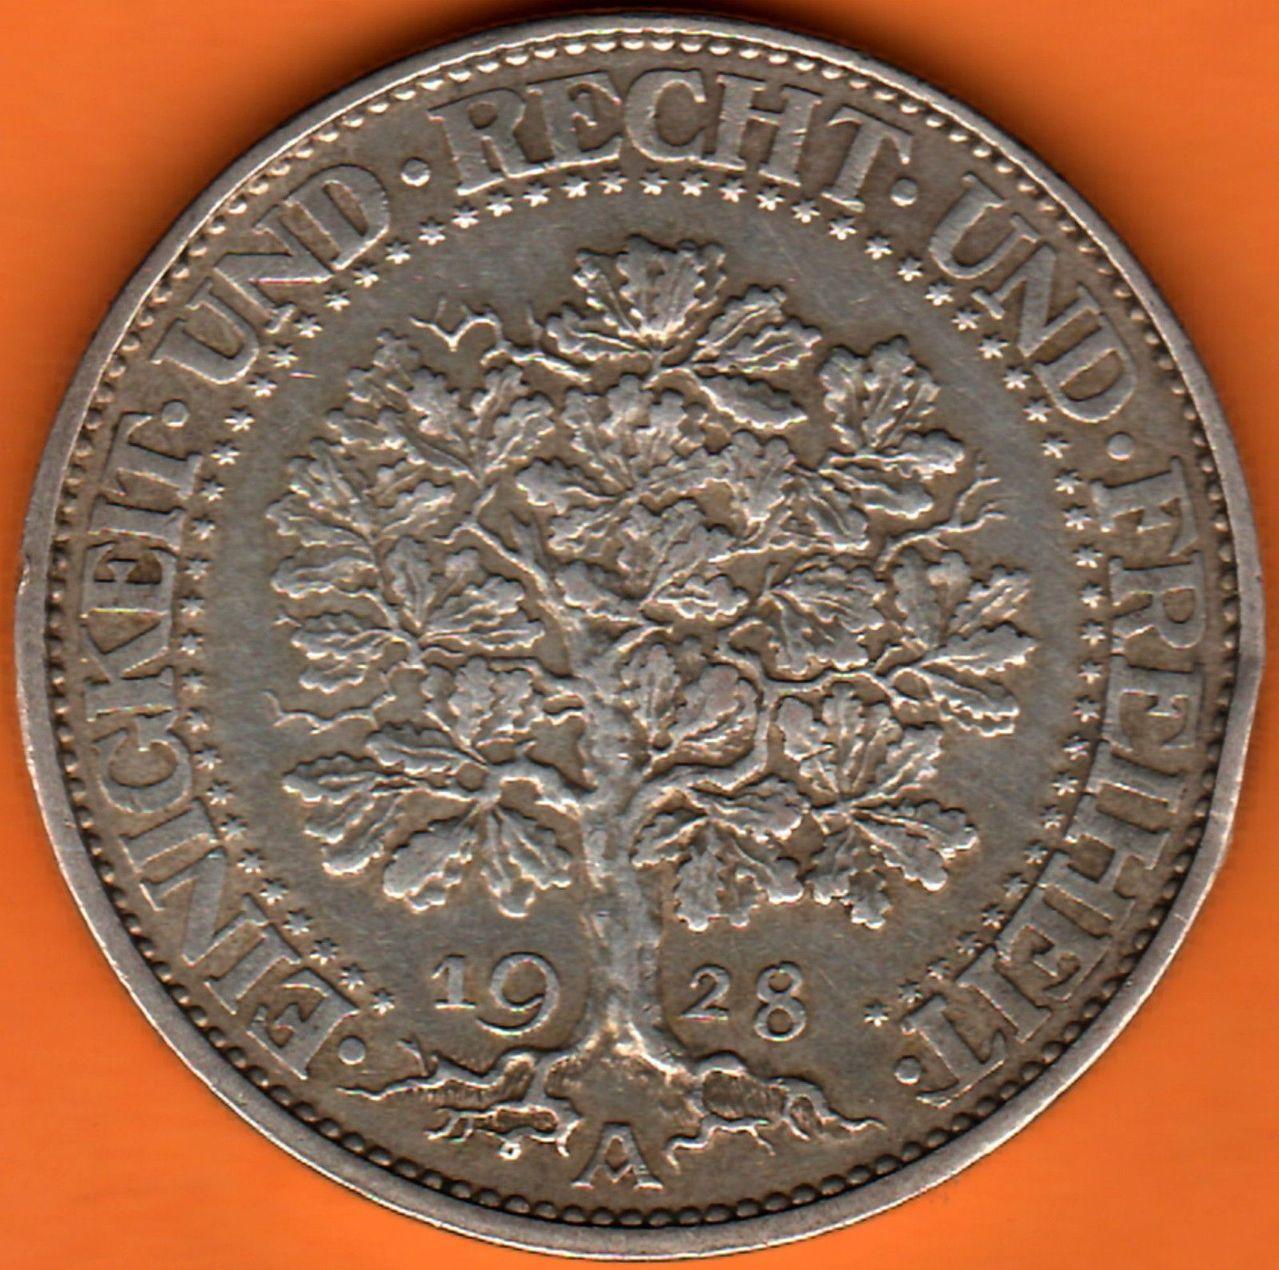 Republica de Weimar 5 Reichsmark 1928 1928b